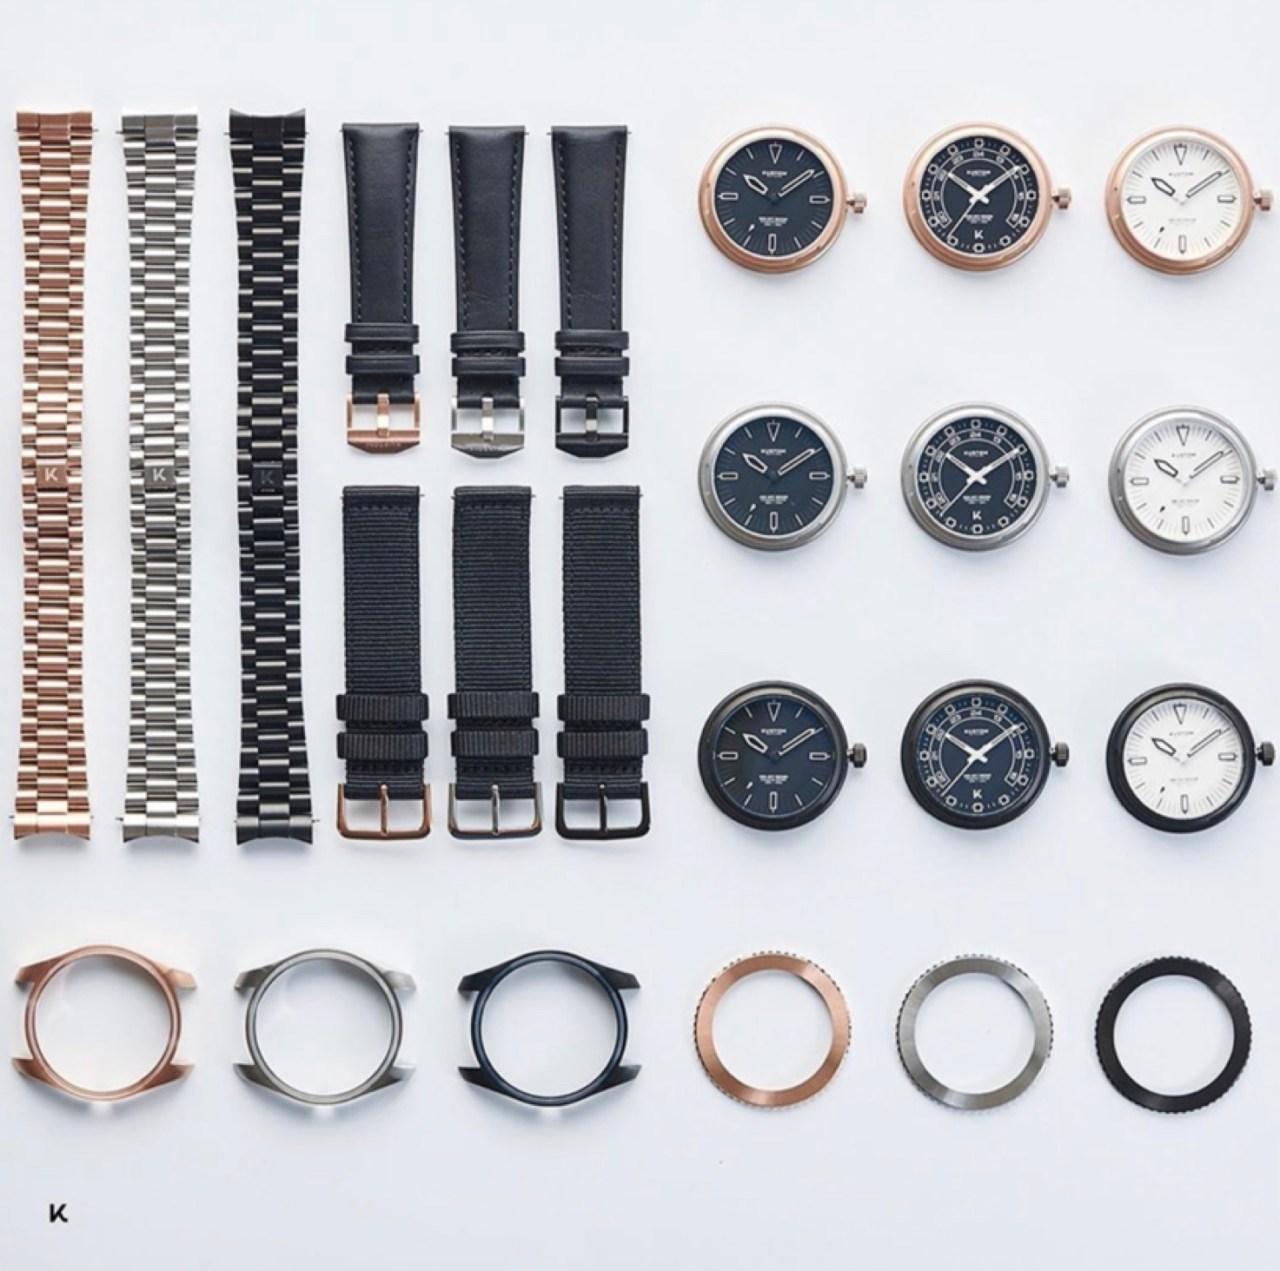 Kustom watches components